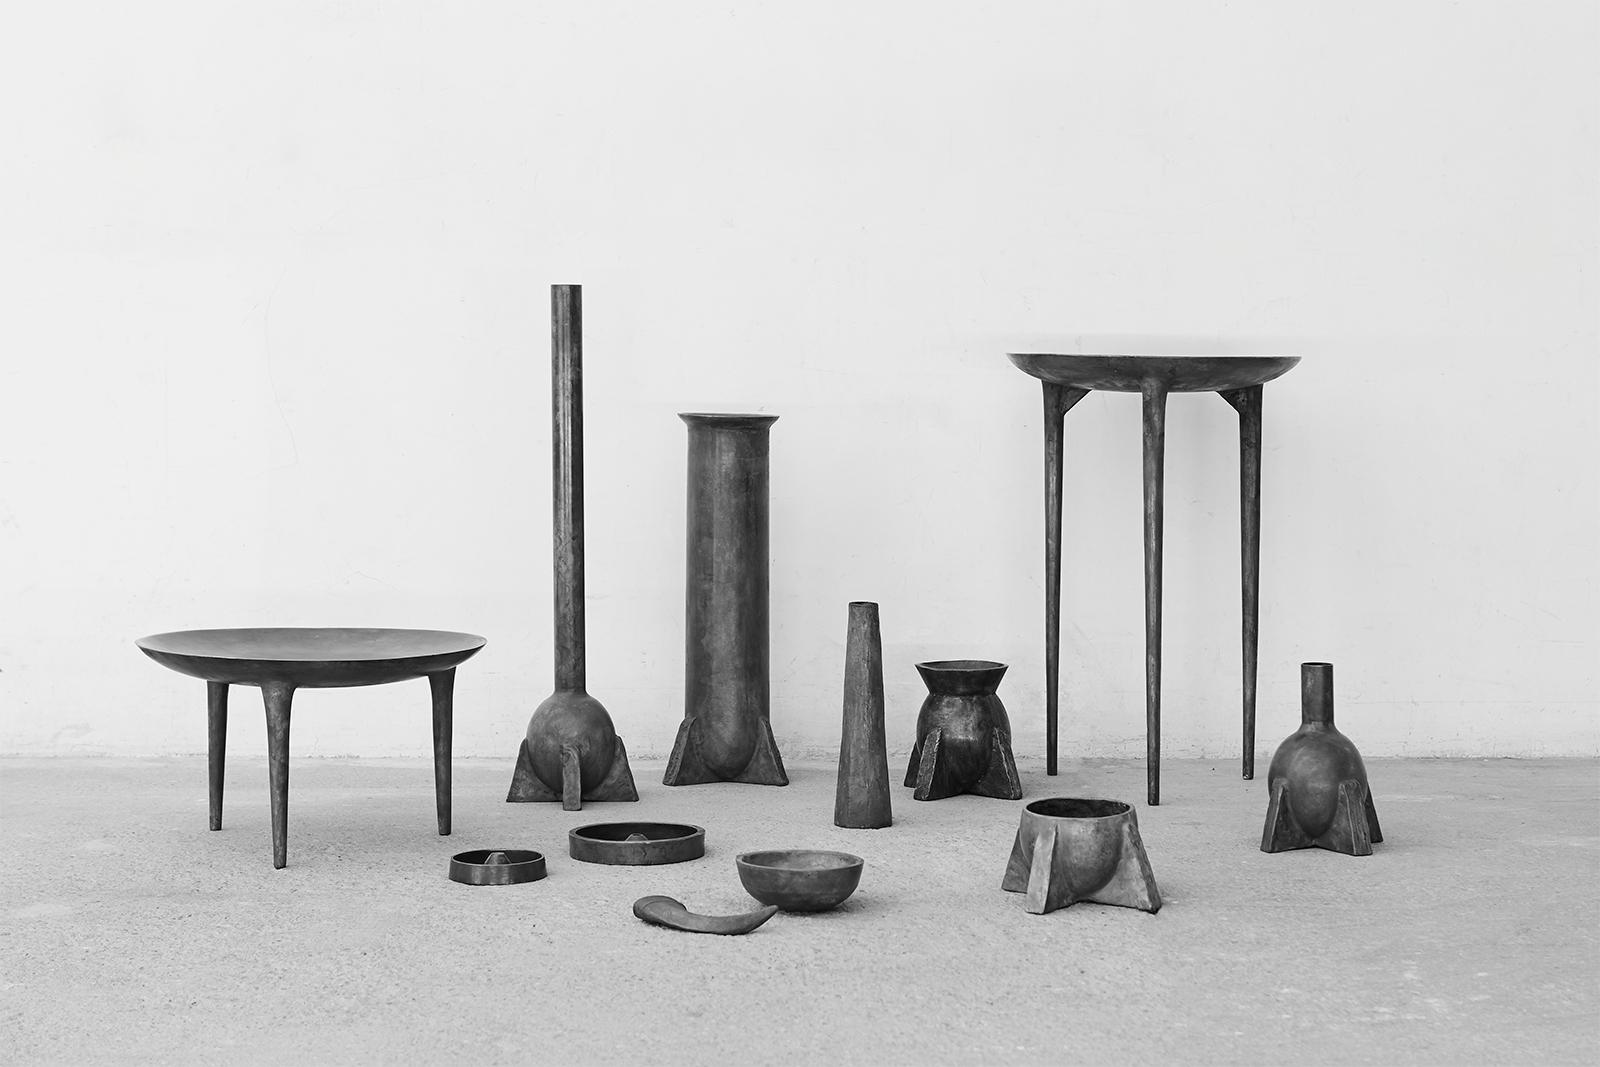 Maison / Objects